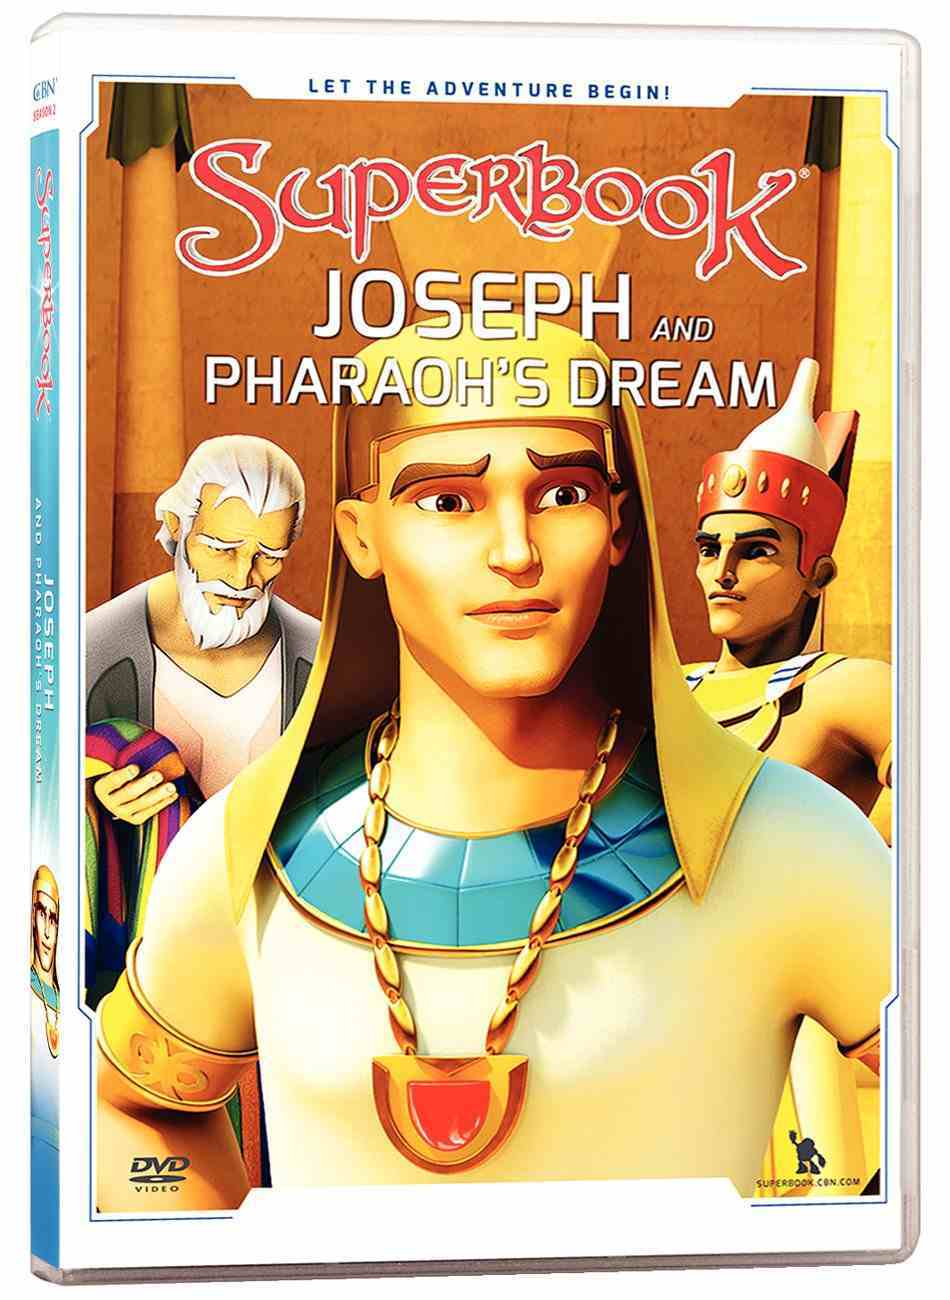 Joseph and Pharoah's Dream (#02 in Superbook Dvd Series Season 02) DVD